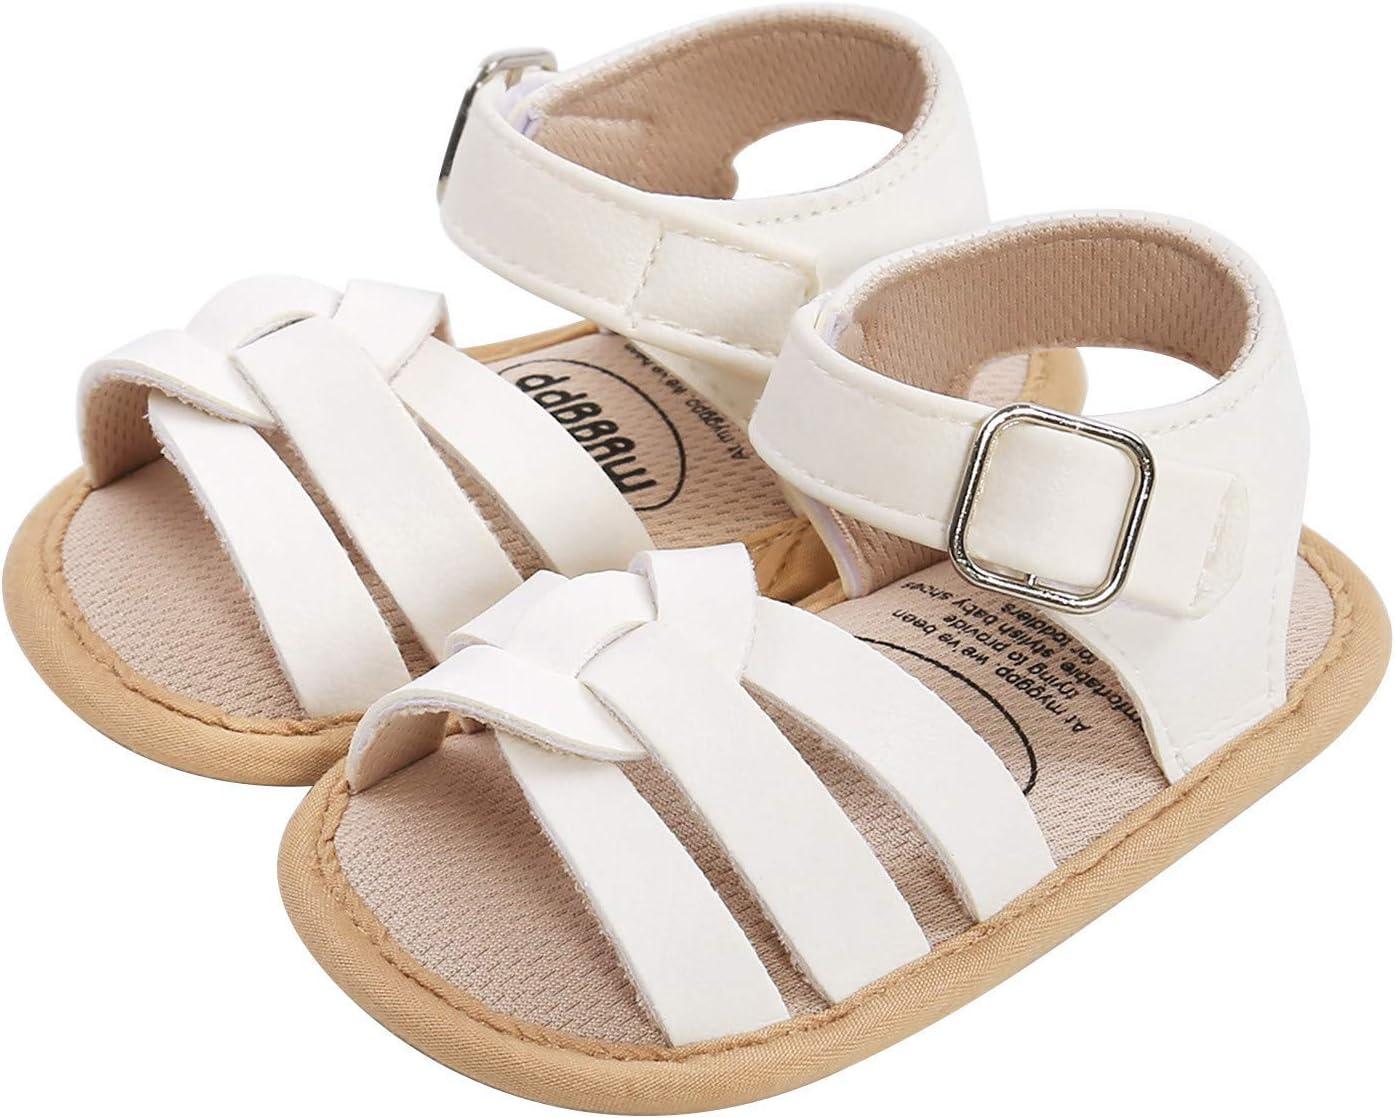 0-12M Baby Boys Girls 2021 Fashion Cheap super special price Soft Sol Rubber Non-Slip Sandals